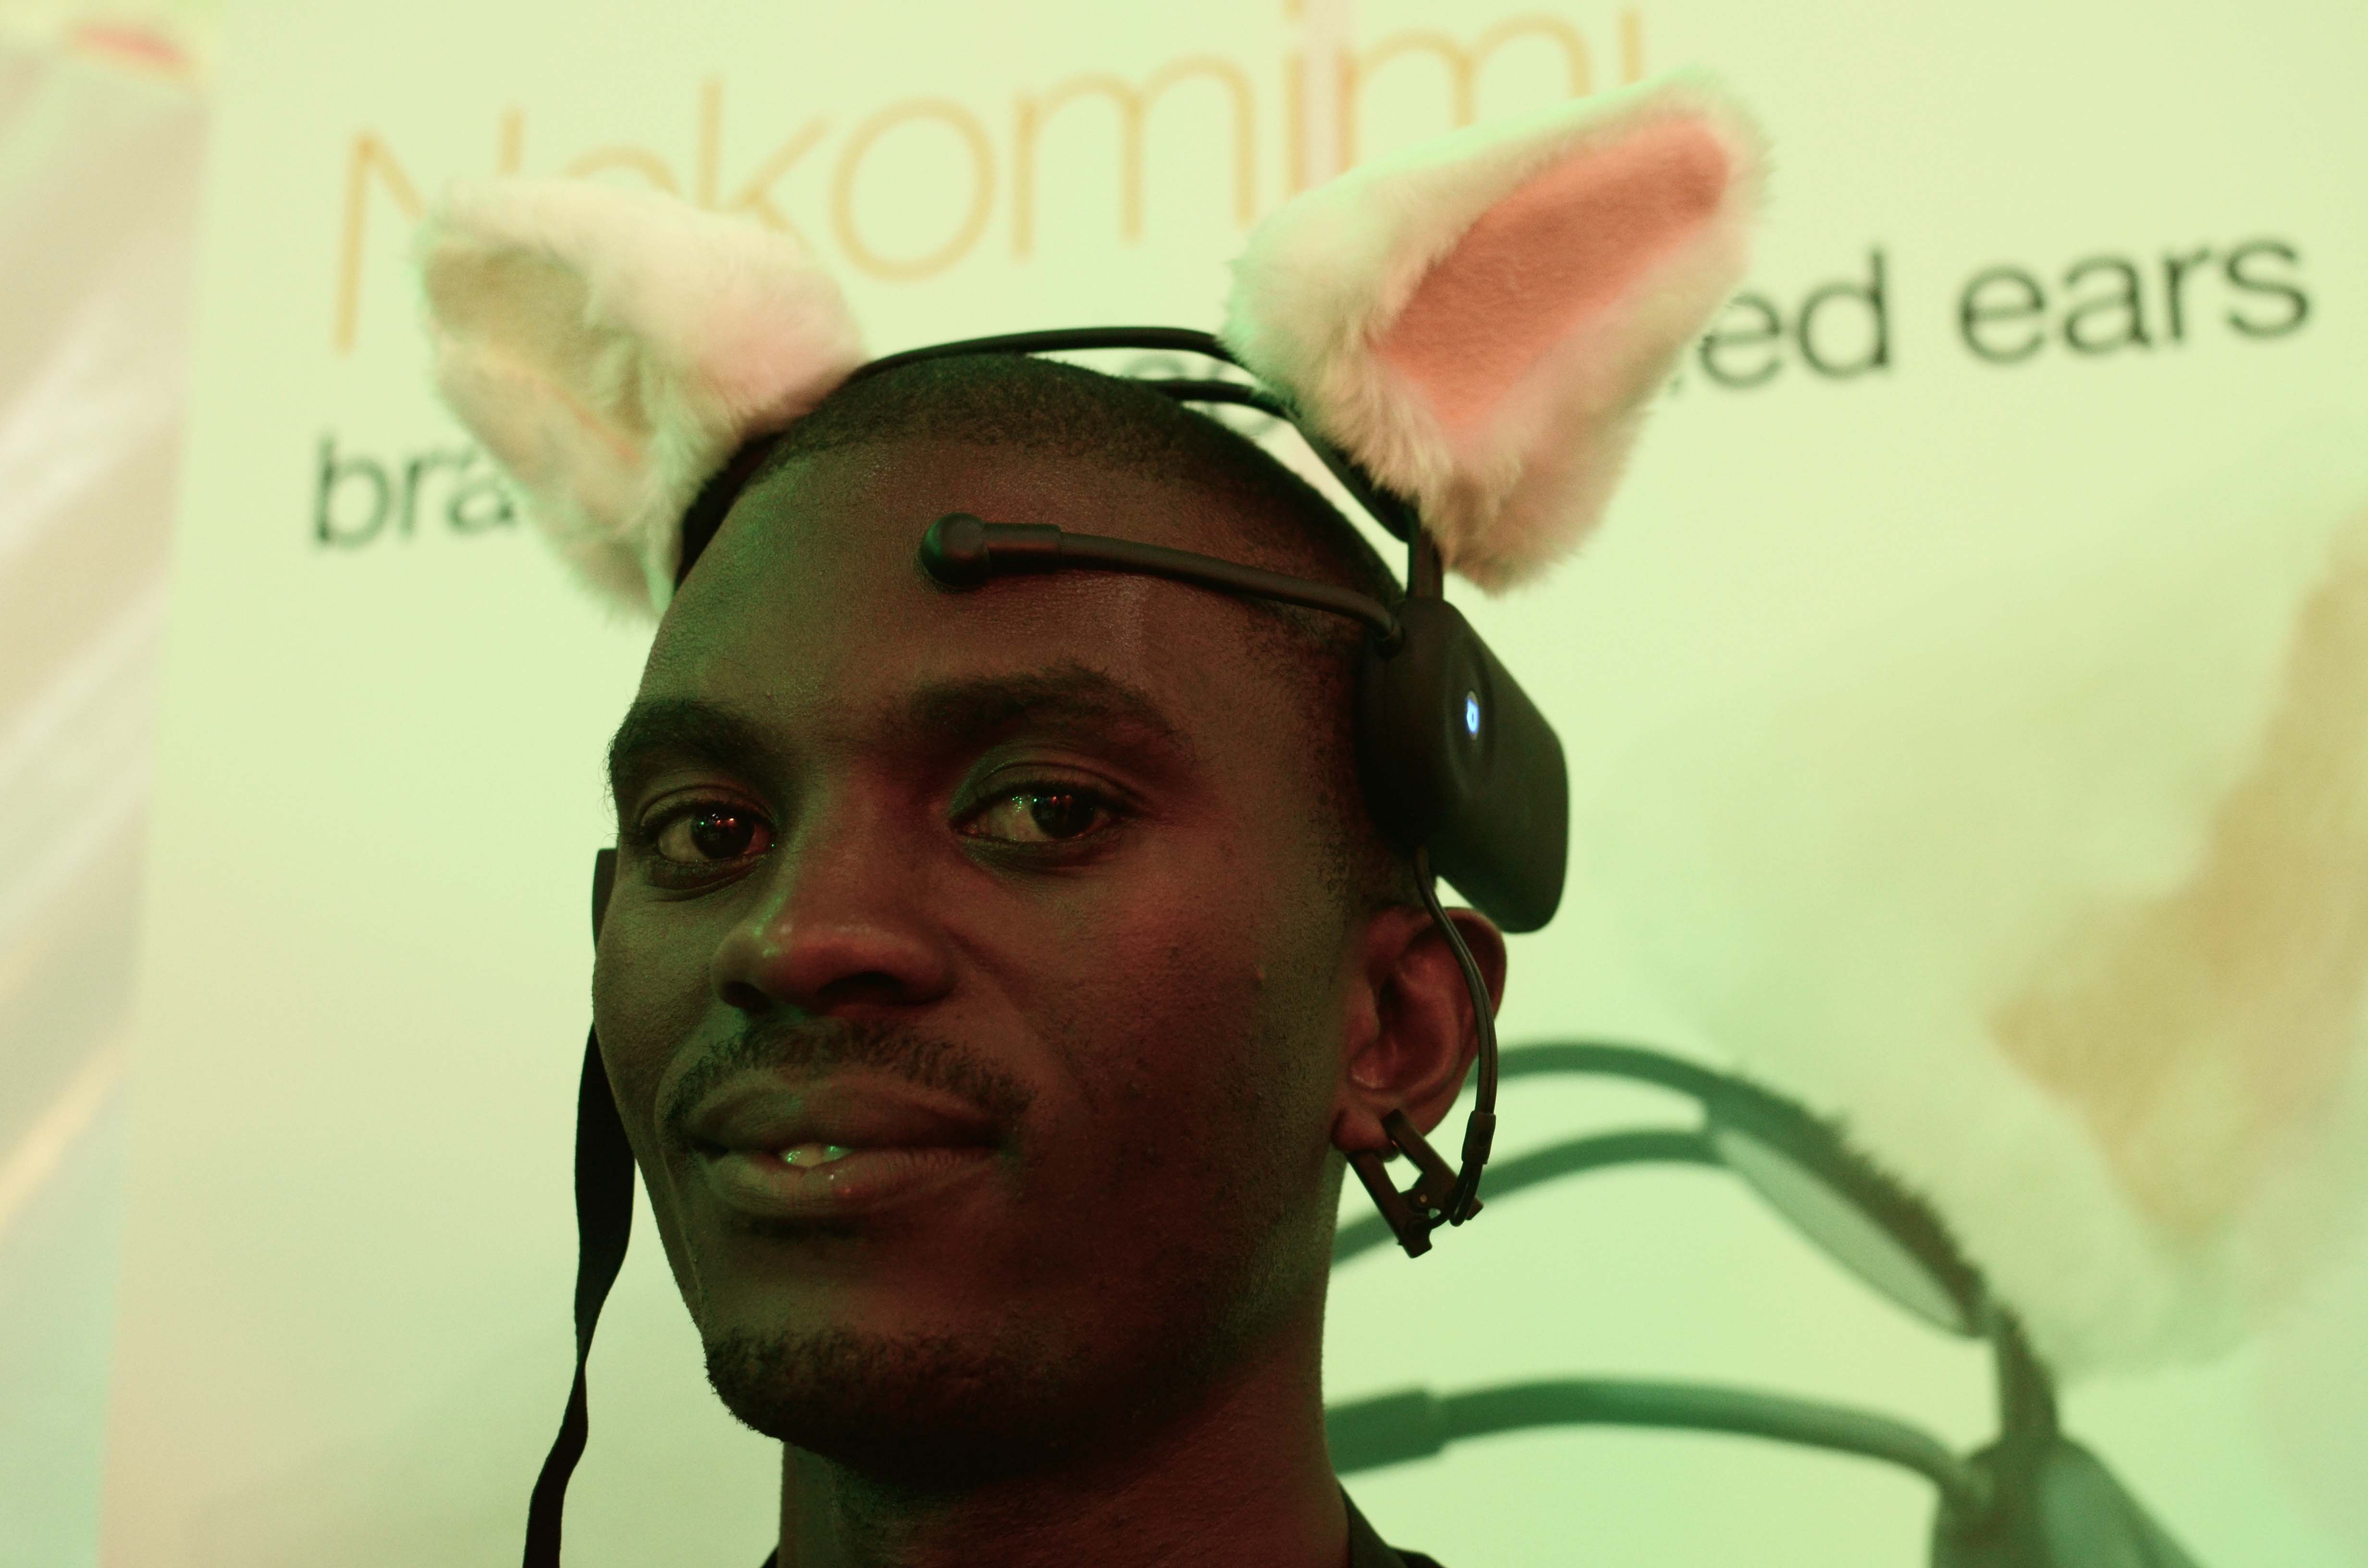 The Nokomimi Brain Wave Ears